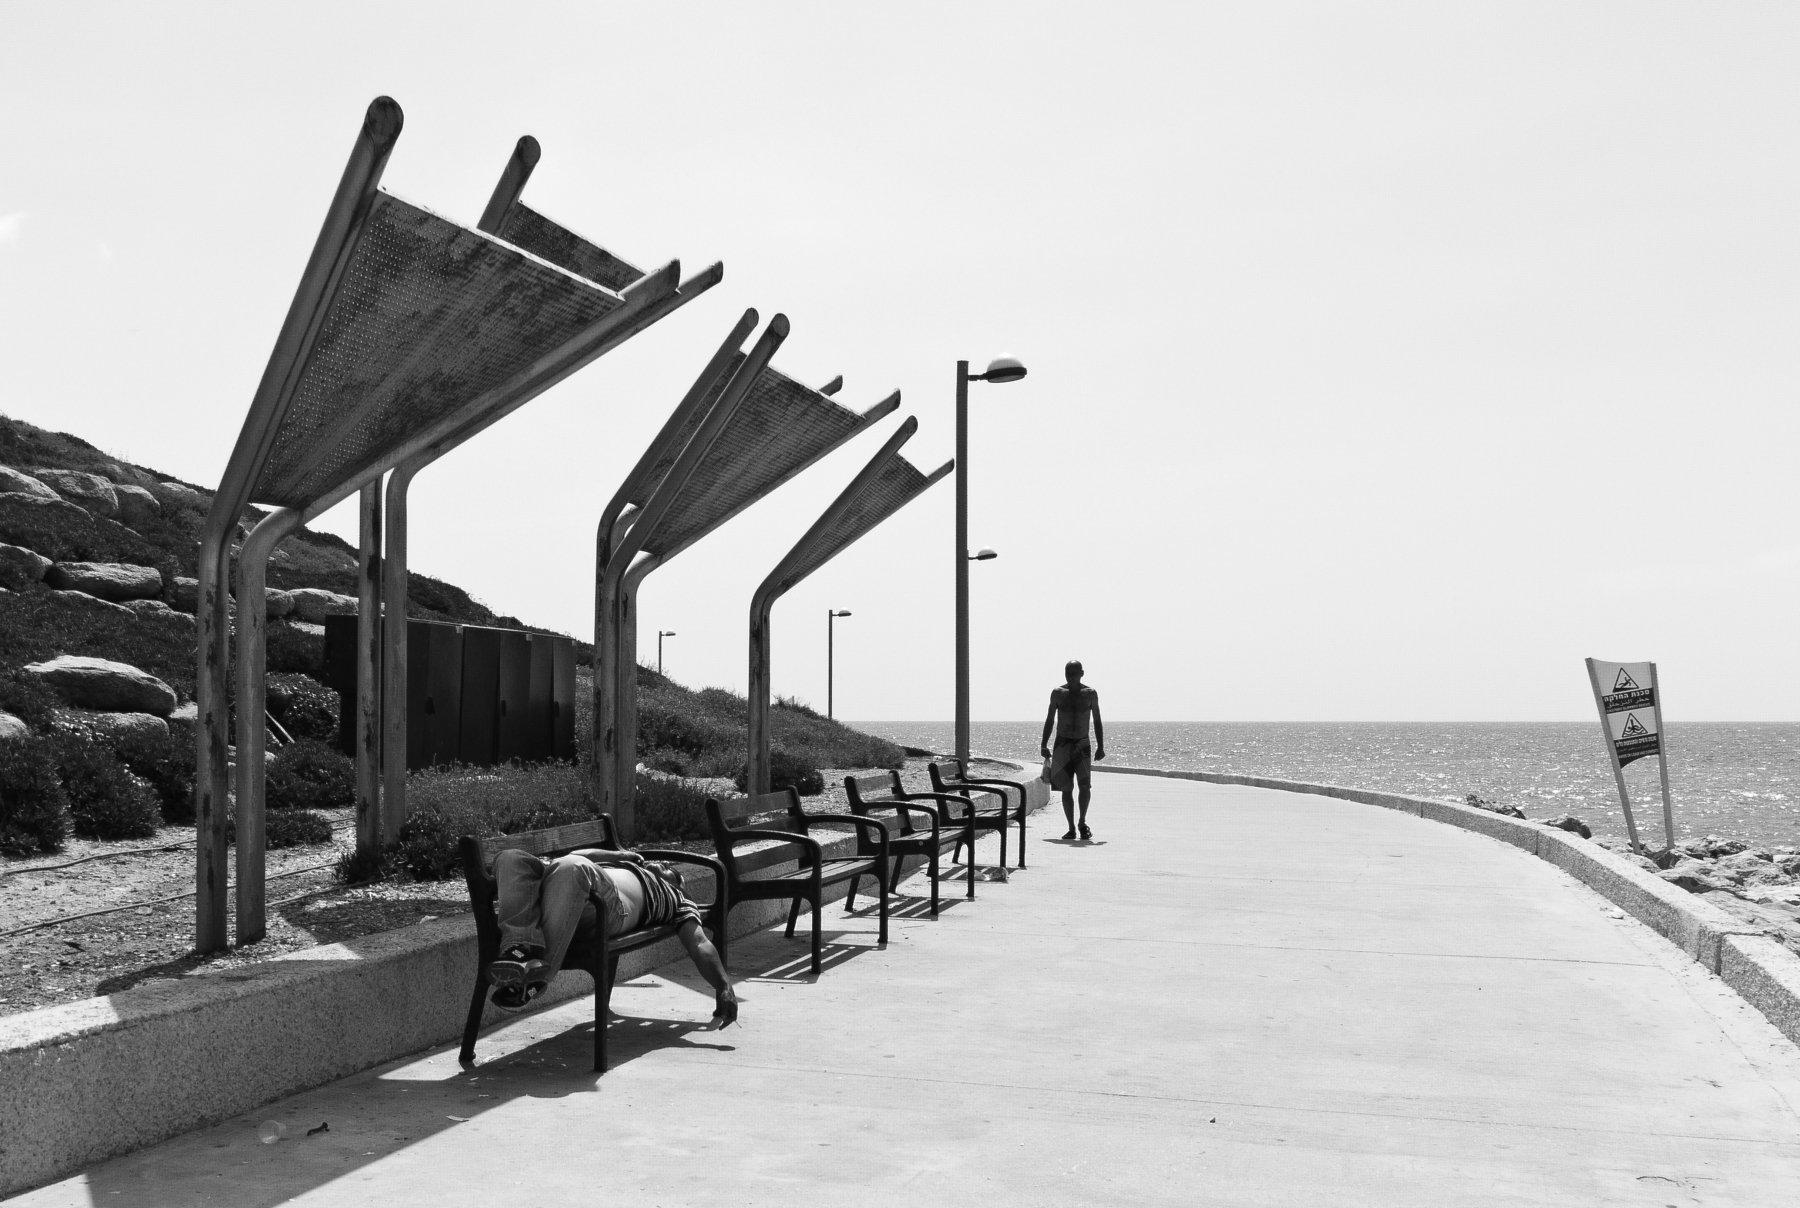 Midday, Street, Black and white, Israel, Jaffa, Lazy, Tel-Aviv, Monochrome, Elena Beregatnova